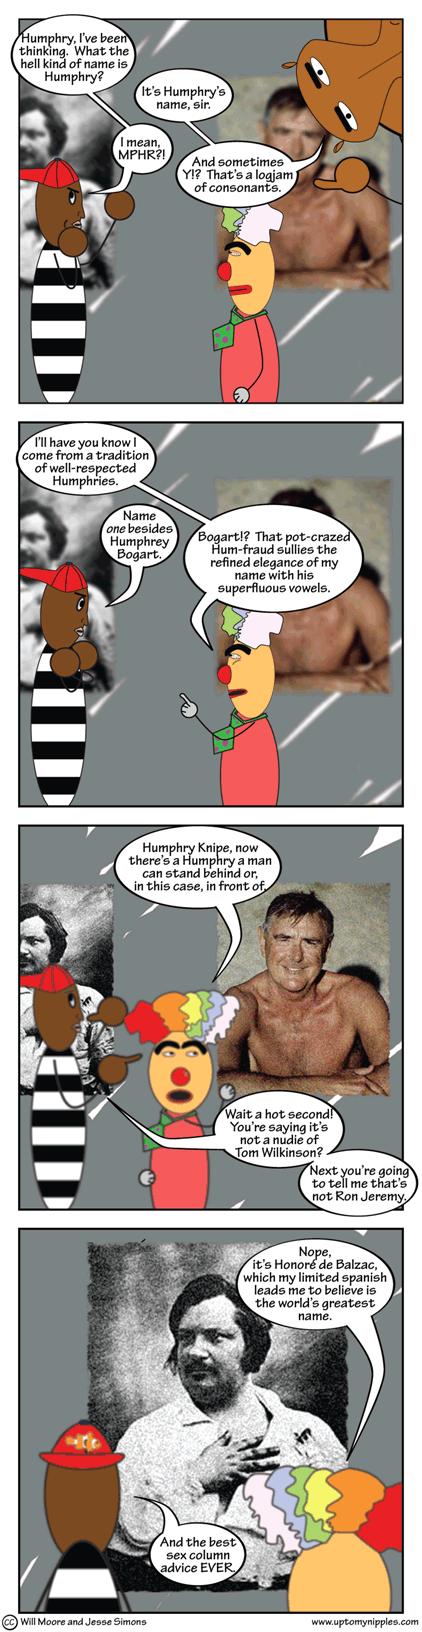 Humphry's Name comic